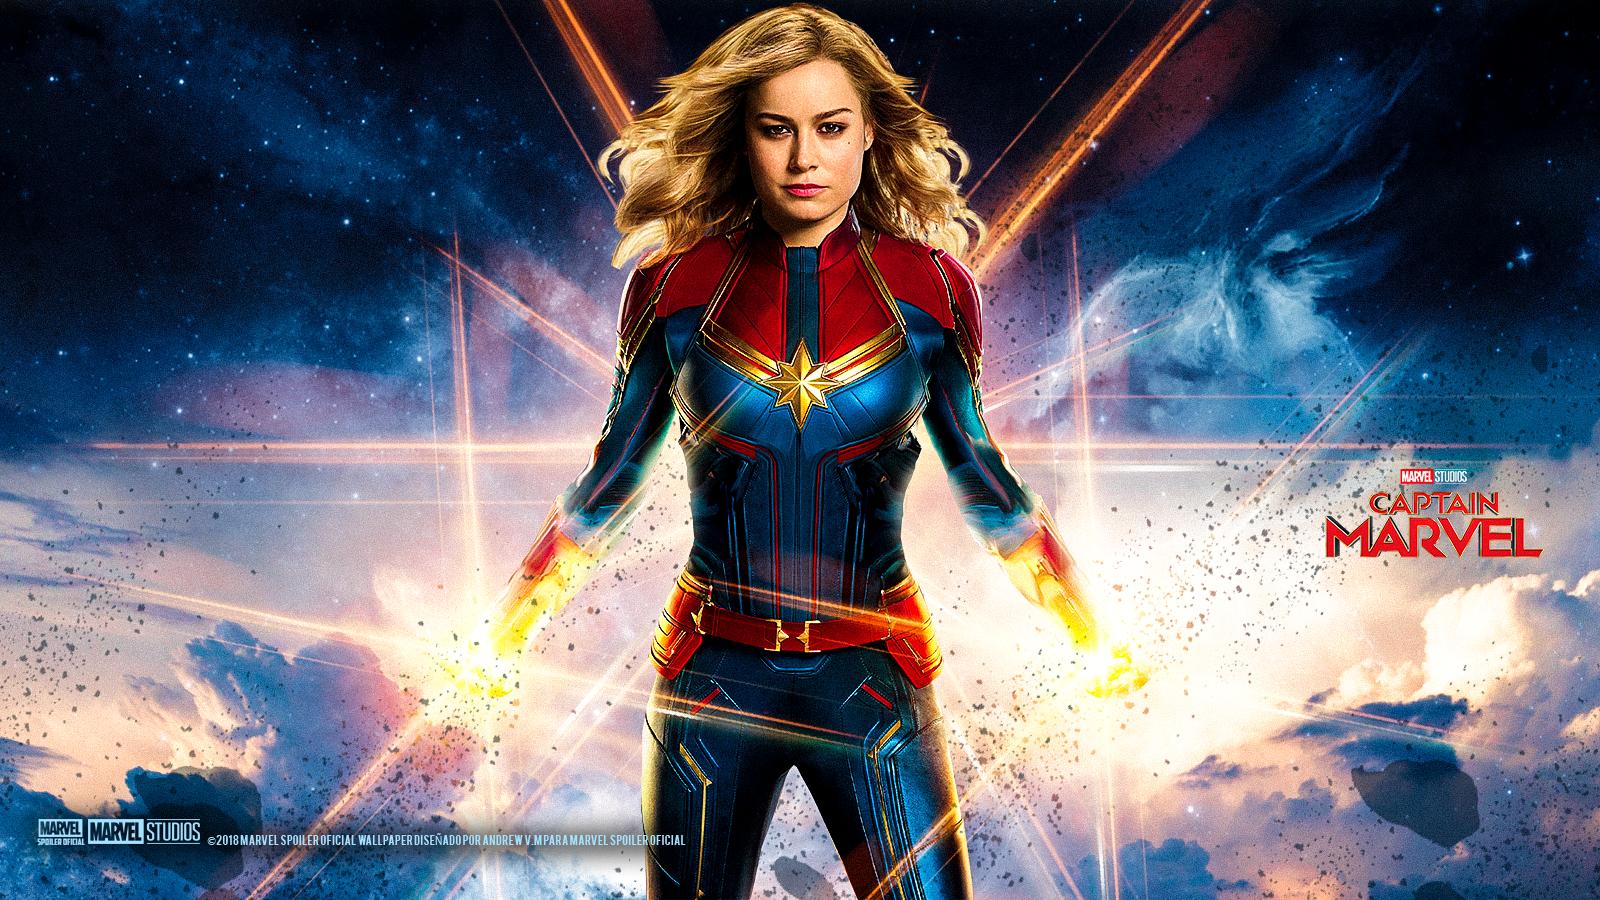 [29+] Captain Marvel Wallpapers on WallpaperSafari